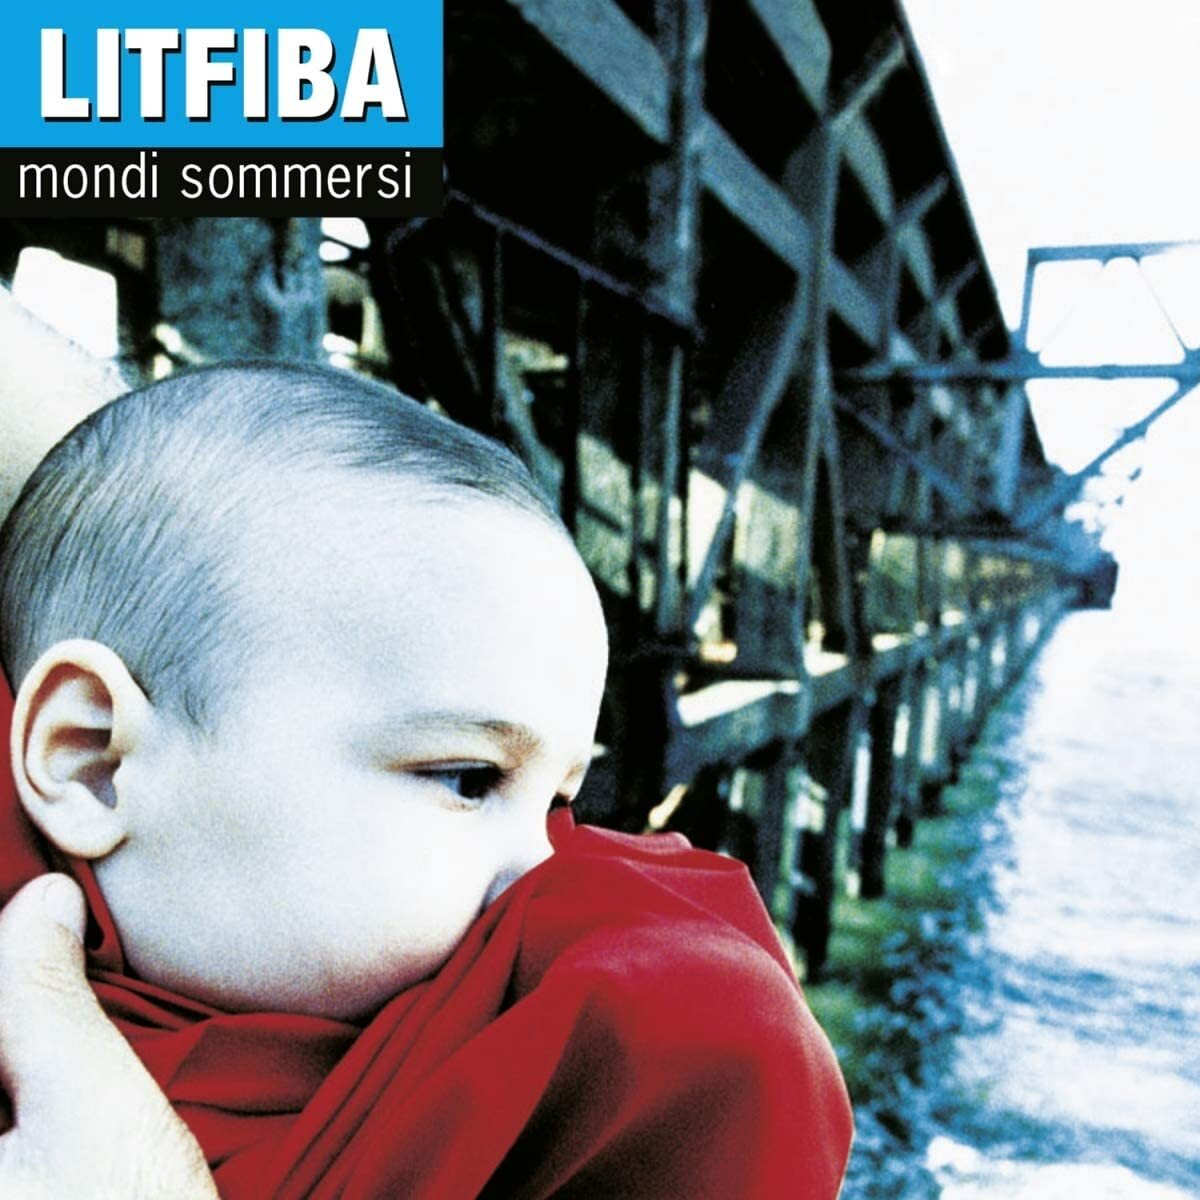 Litfiba-mondi-sommersi